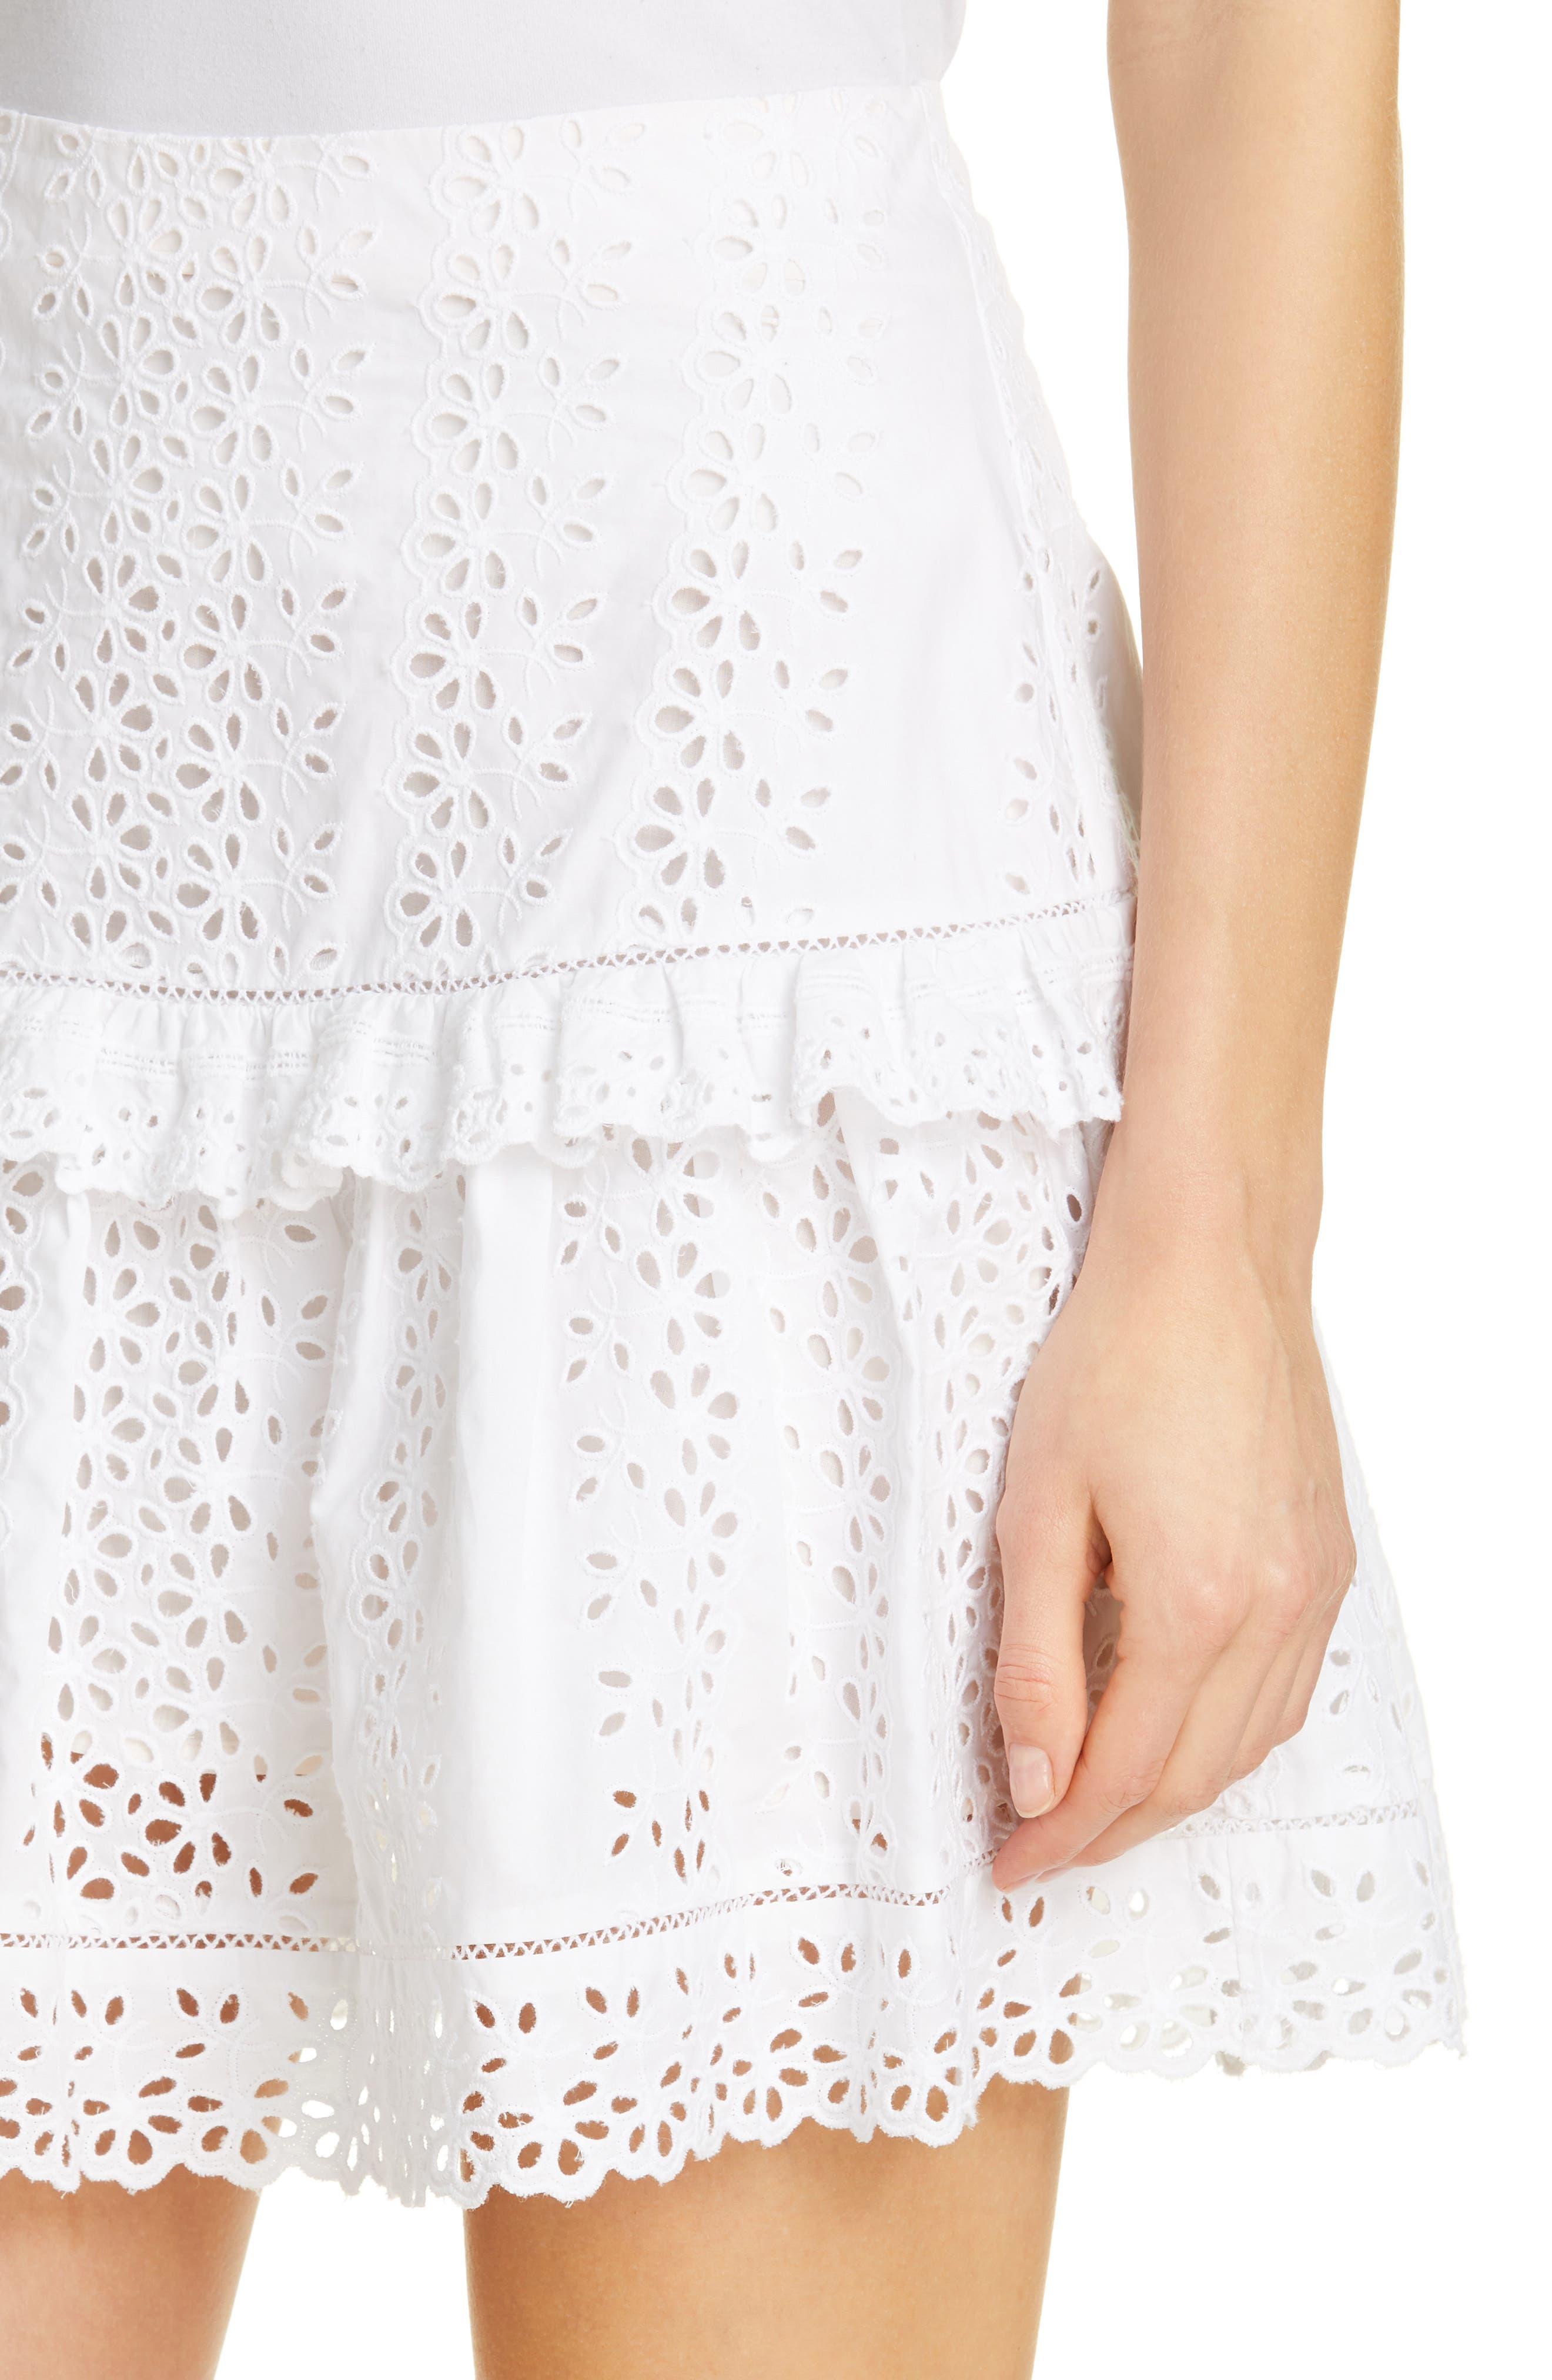 REBECCA TAYLOR, Karina Cotton Eyelet Skirt, Alternate thumbnail 4, color, MILK